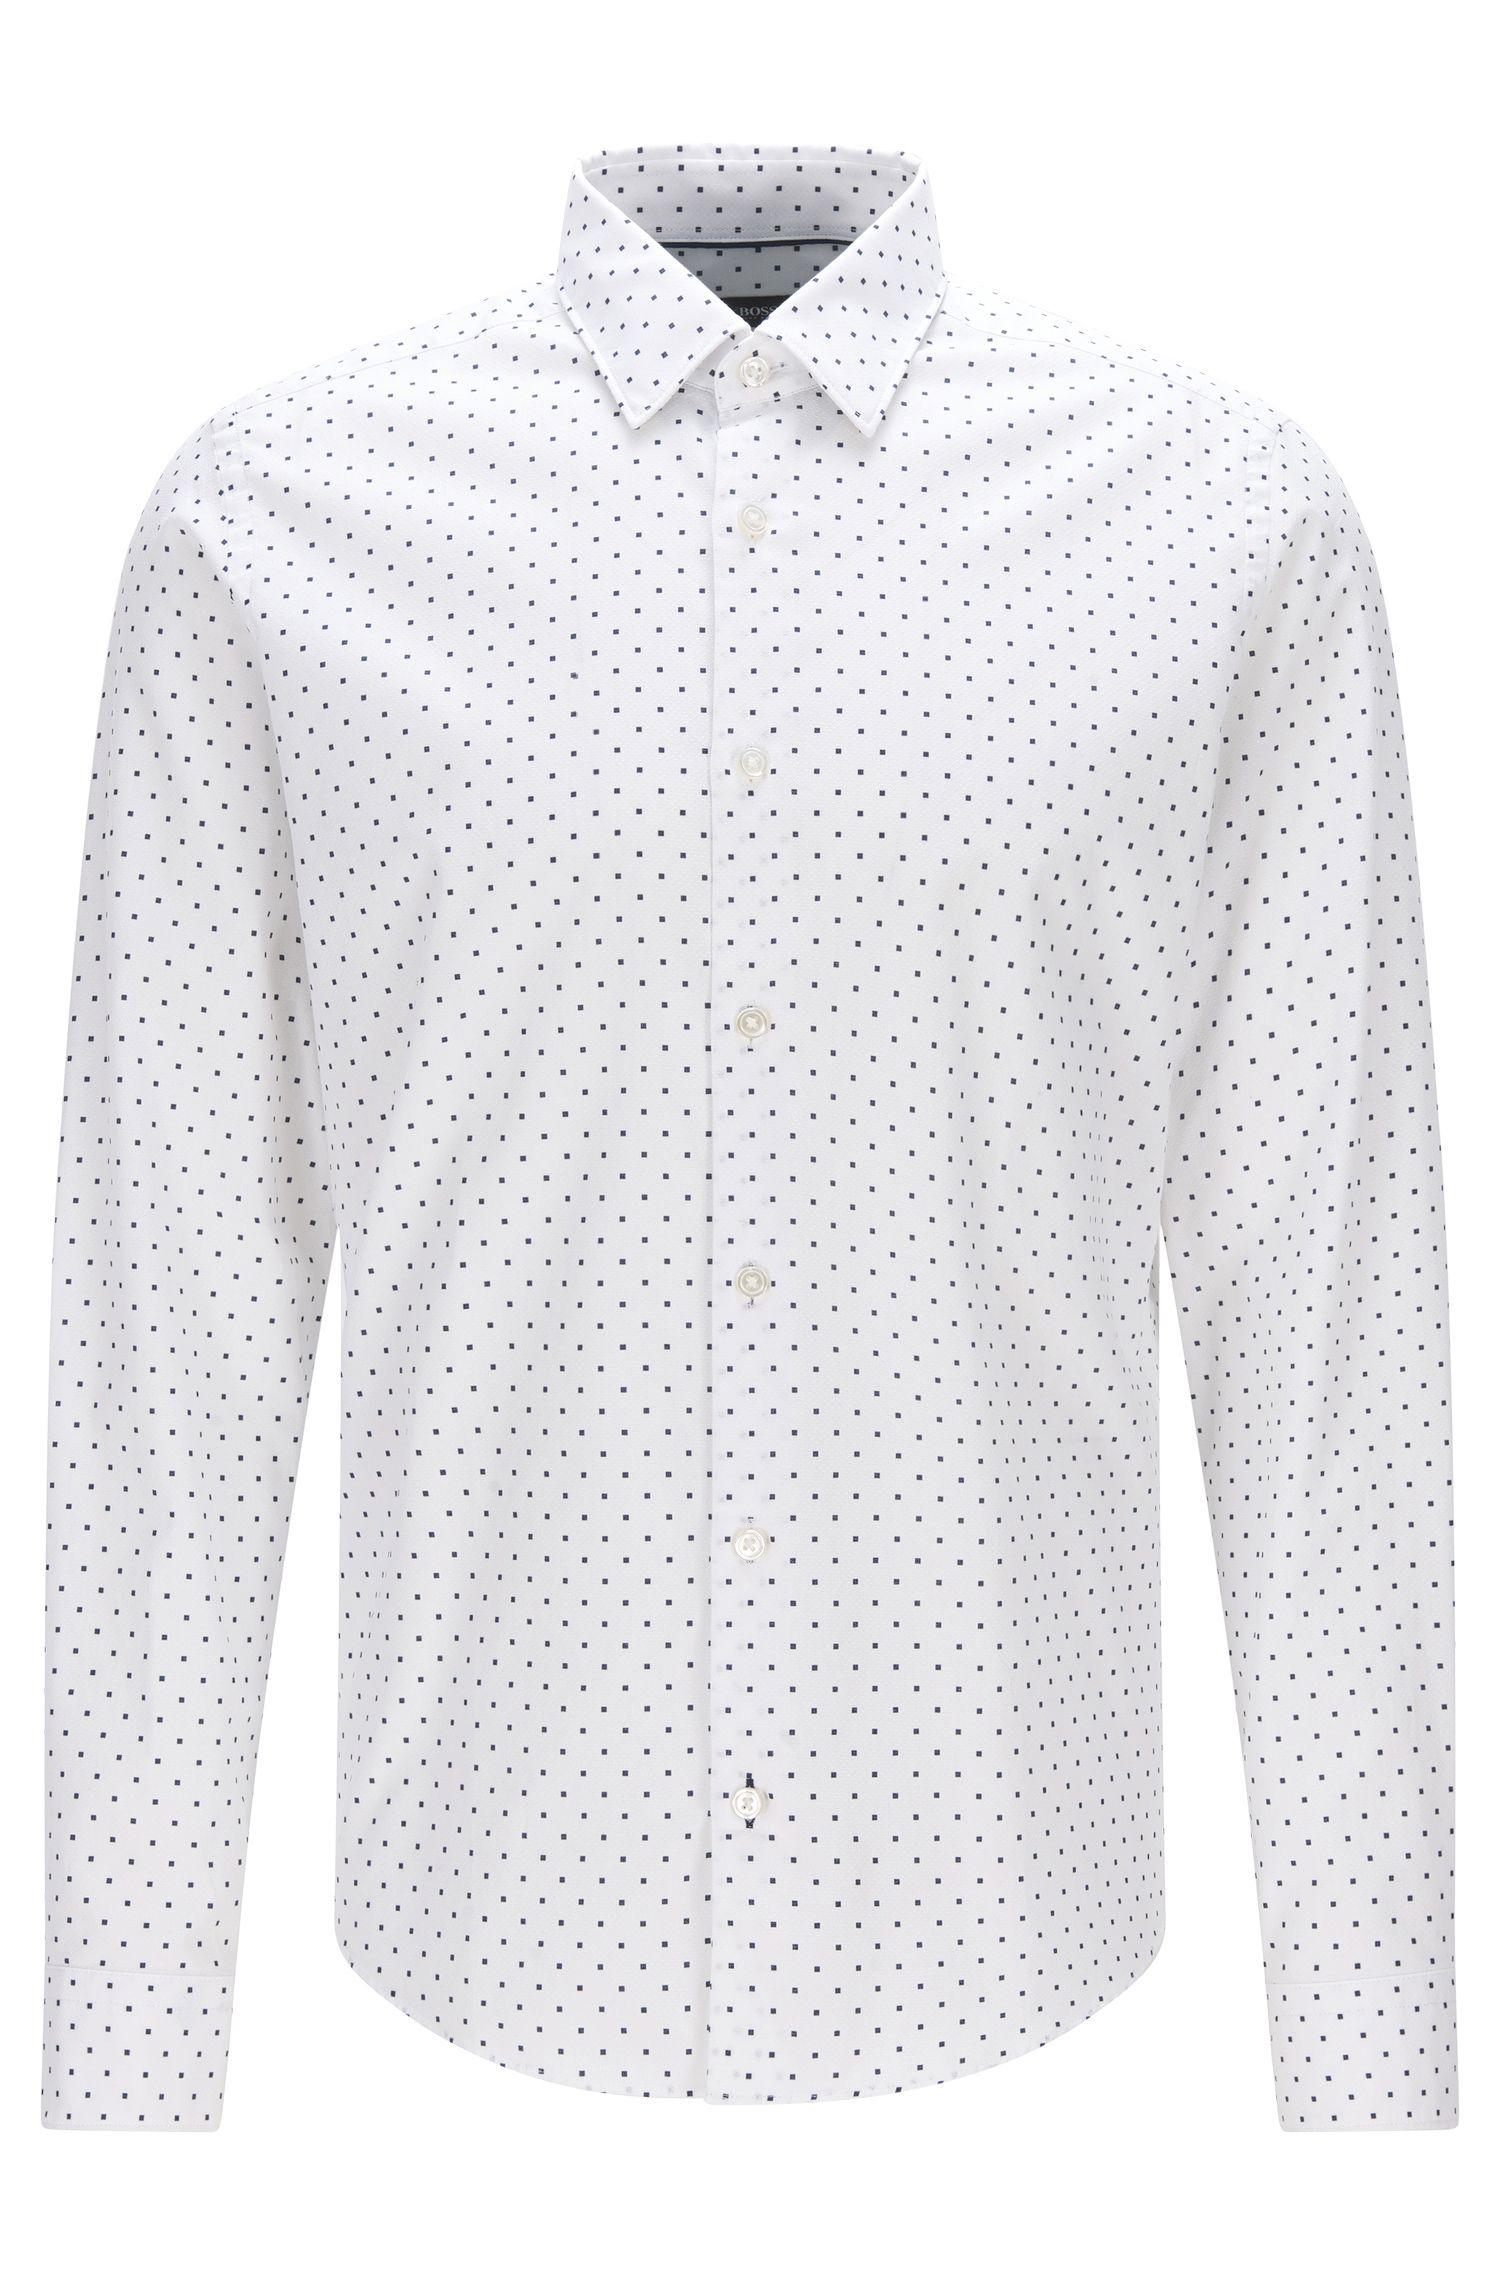 Regular-fit cotton jacquard shirt in Italian dot print